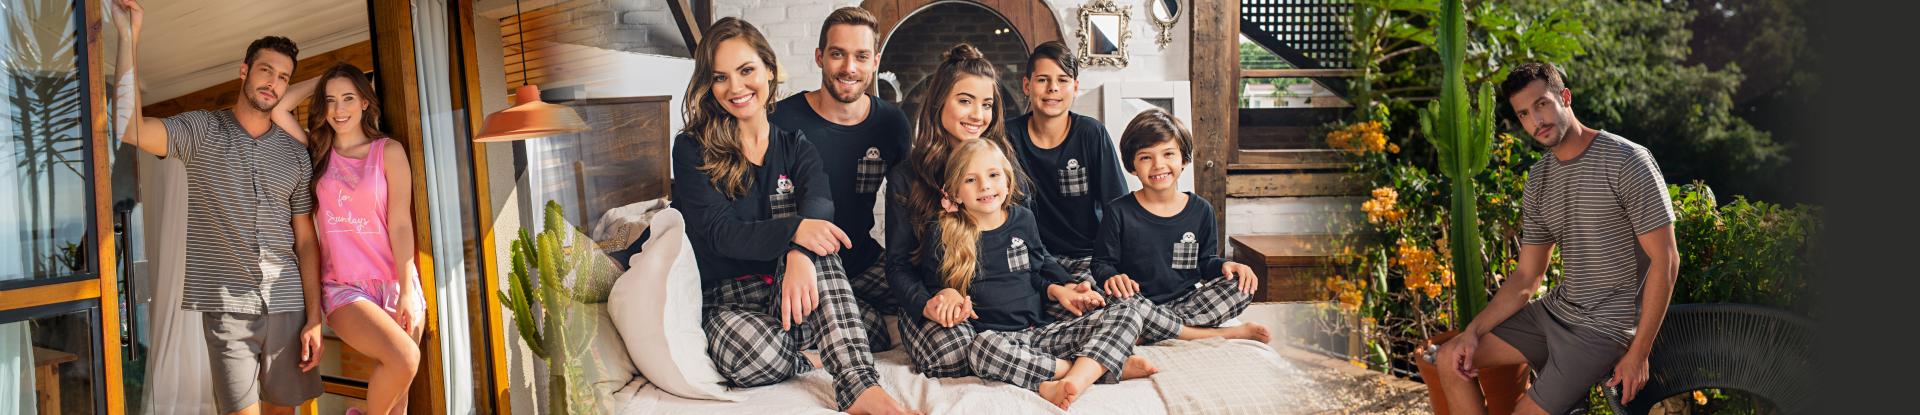 Família completa Xadrez - Bicho Preguiça